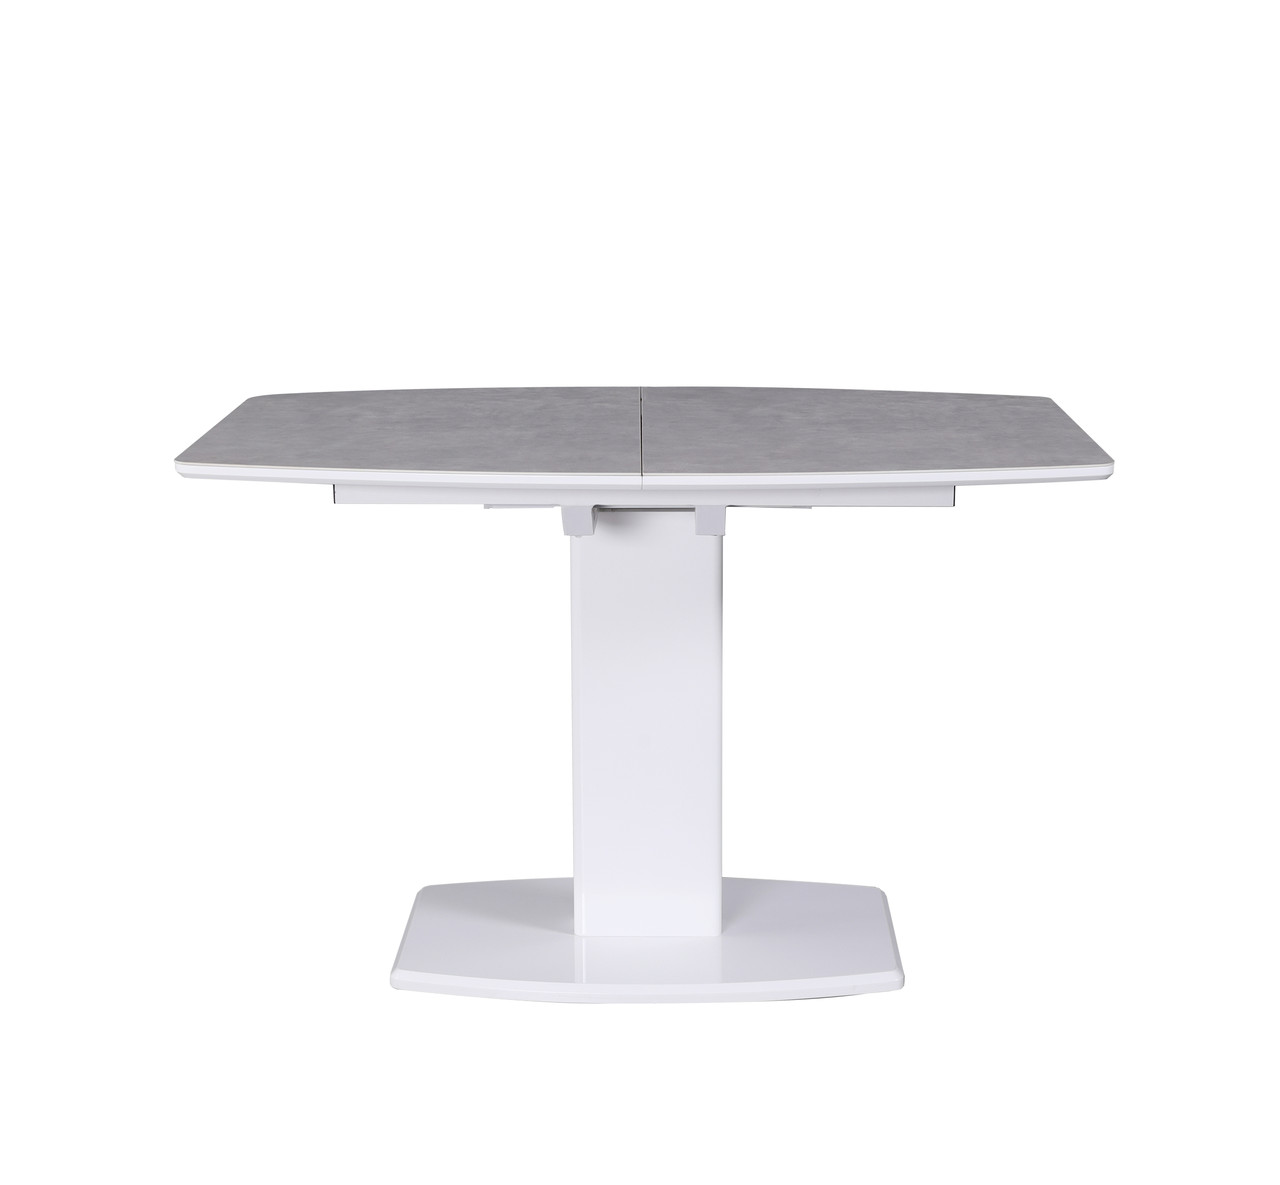 Стол обеденный (керамика) Милан-1 TES Mobili